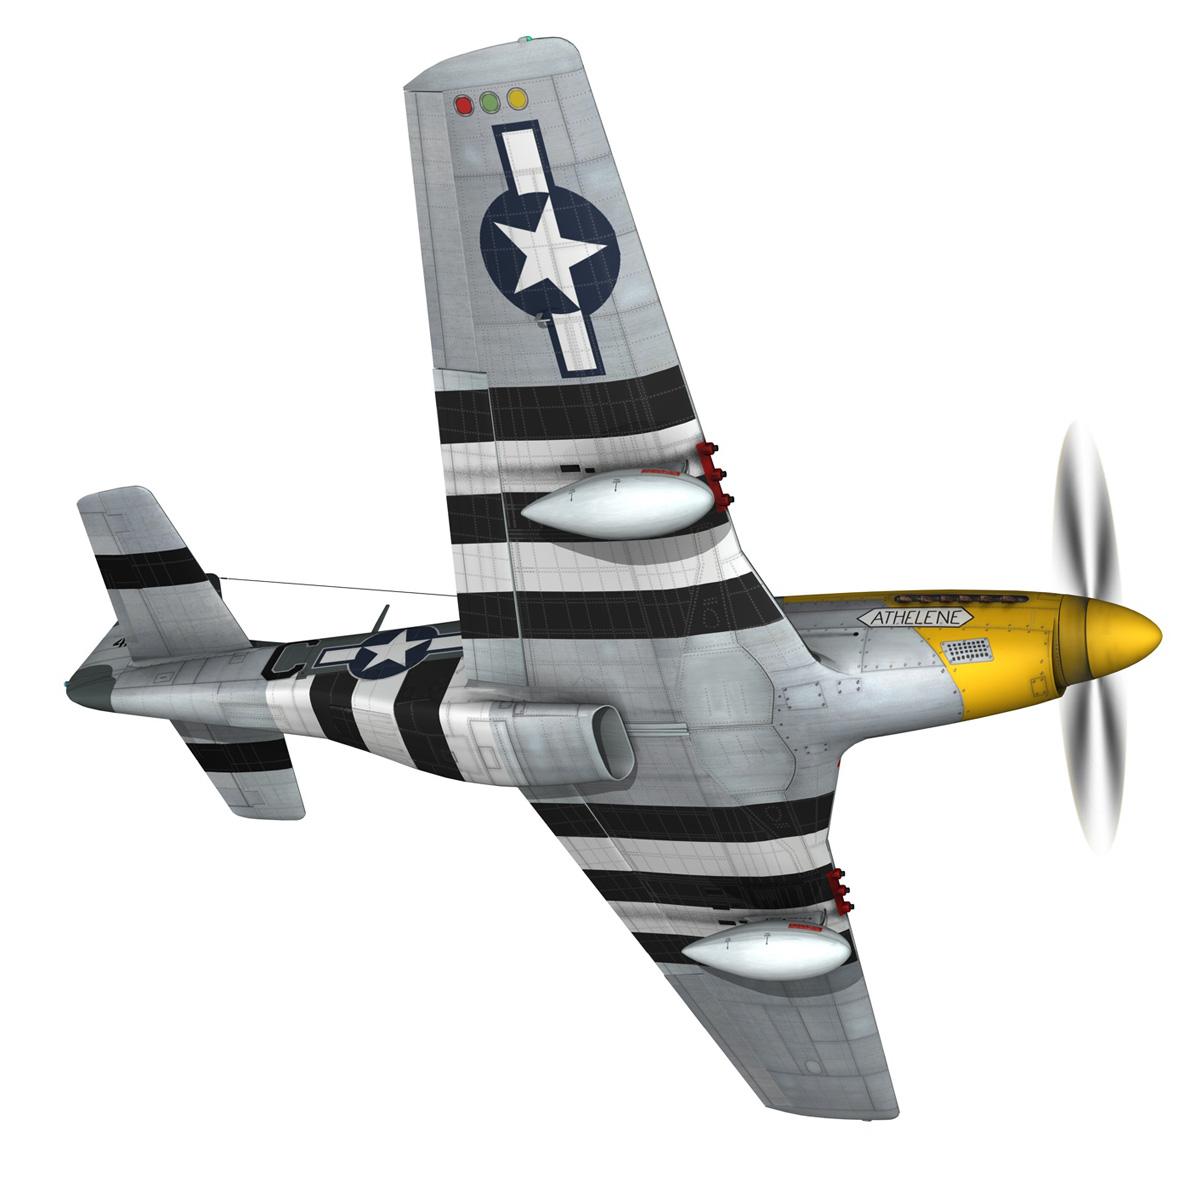 north american p-51d mustang – lou iv 3d model fbx c4d lwo obj 272603